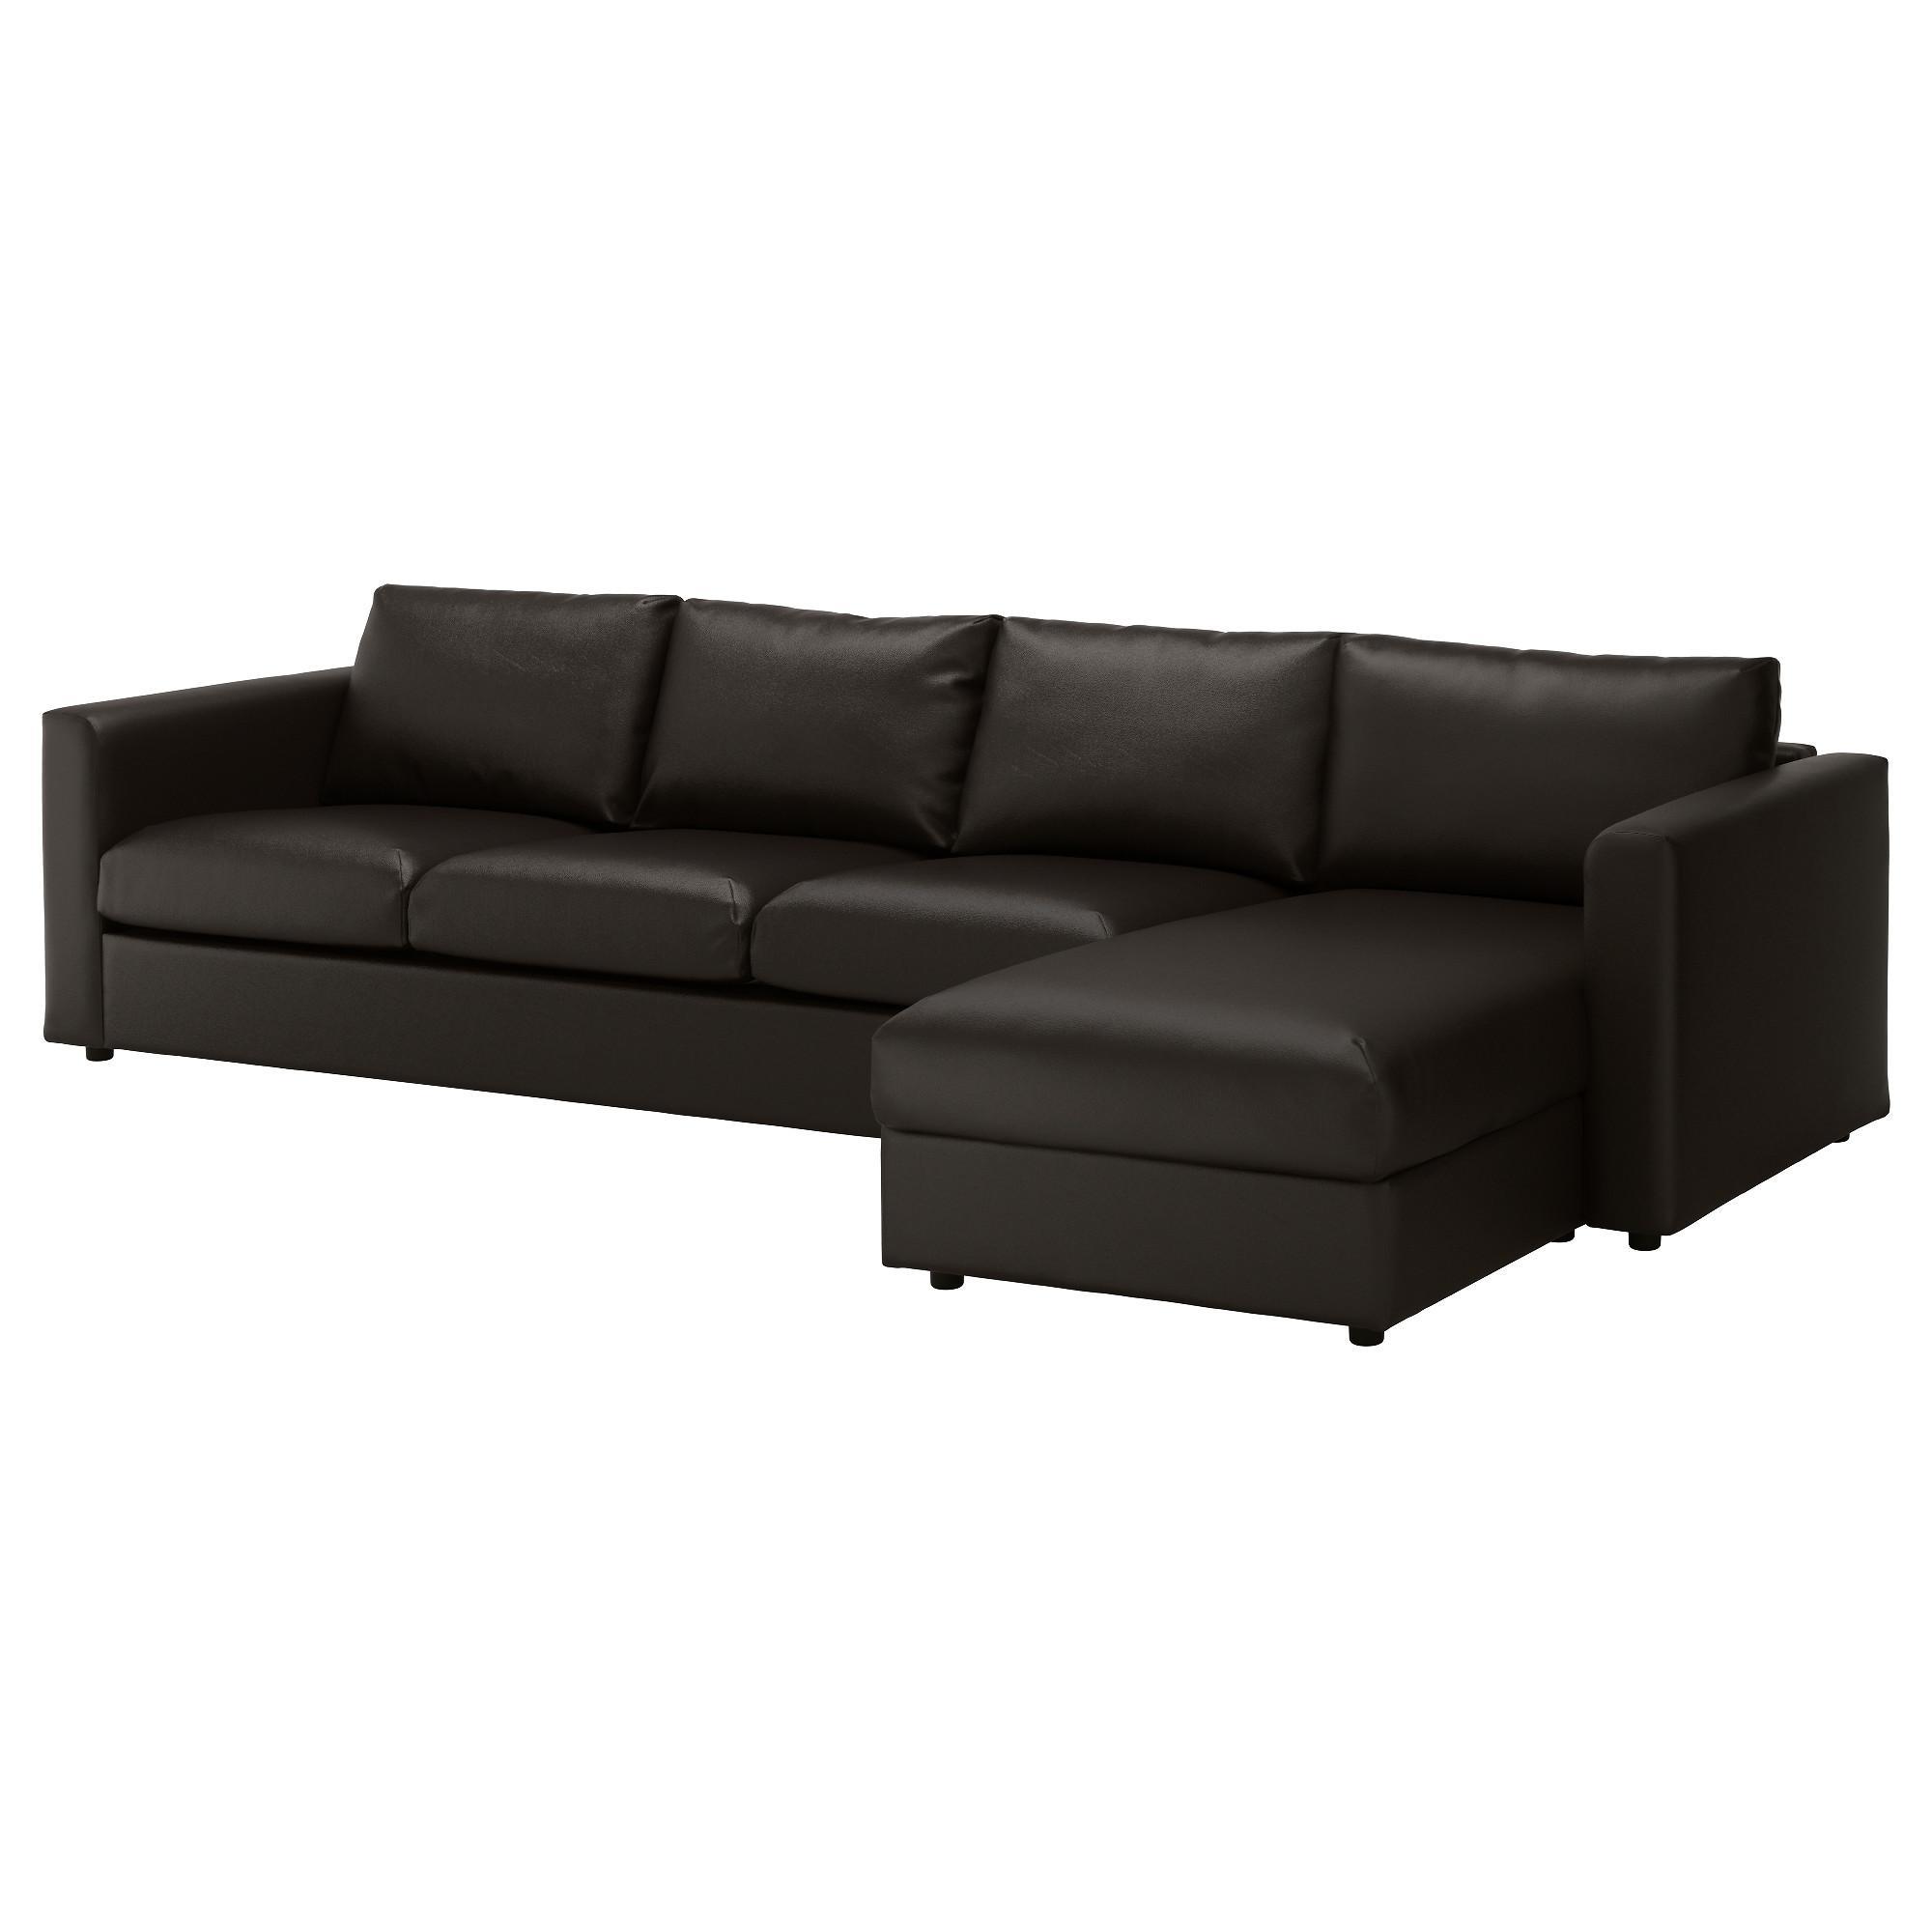 Vimle 4 Seat Sofa With Chaise Longue/farsta Black – Ikea Regarding 4 Seat Sofas (View 16 of 20)